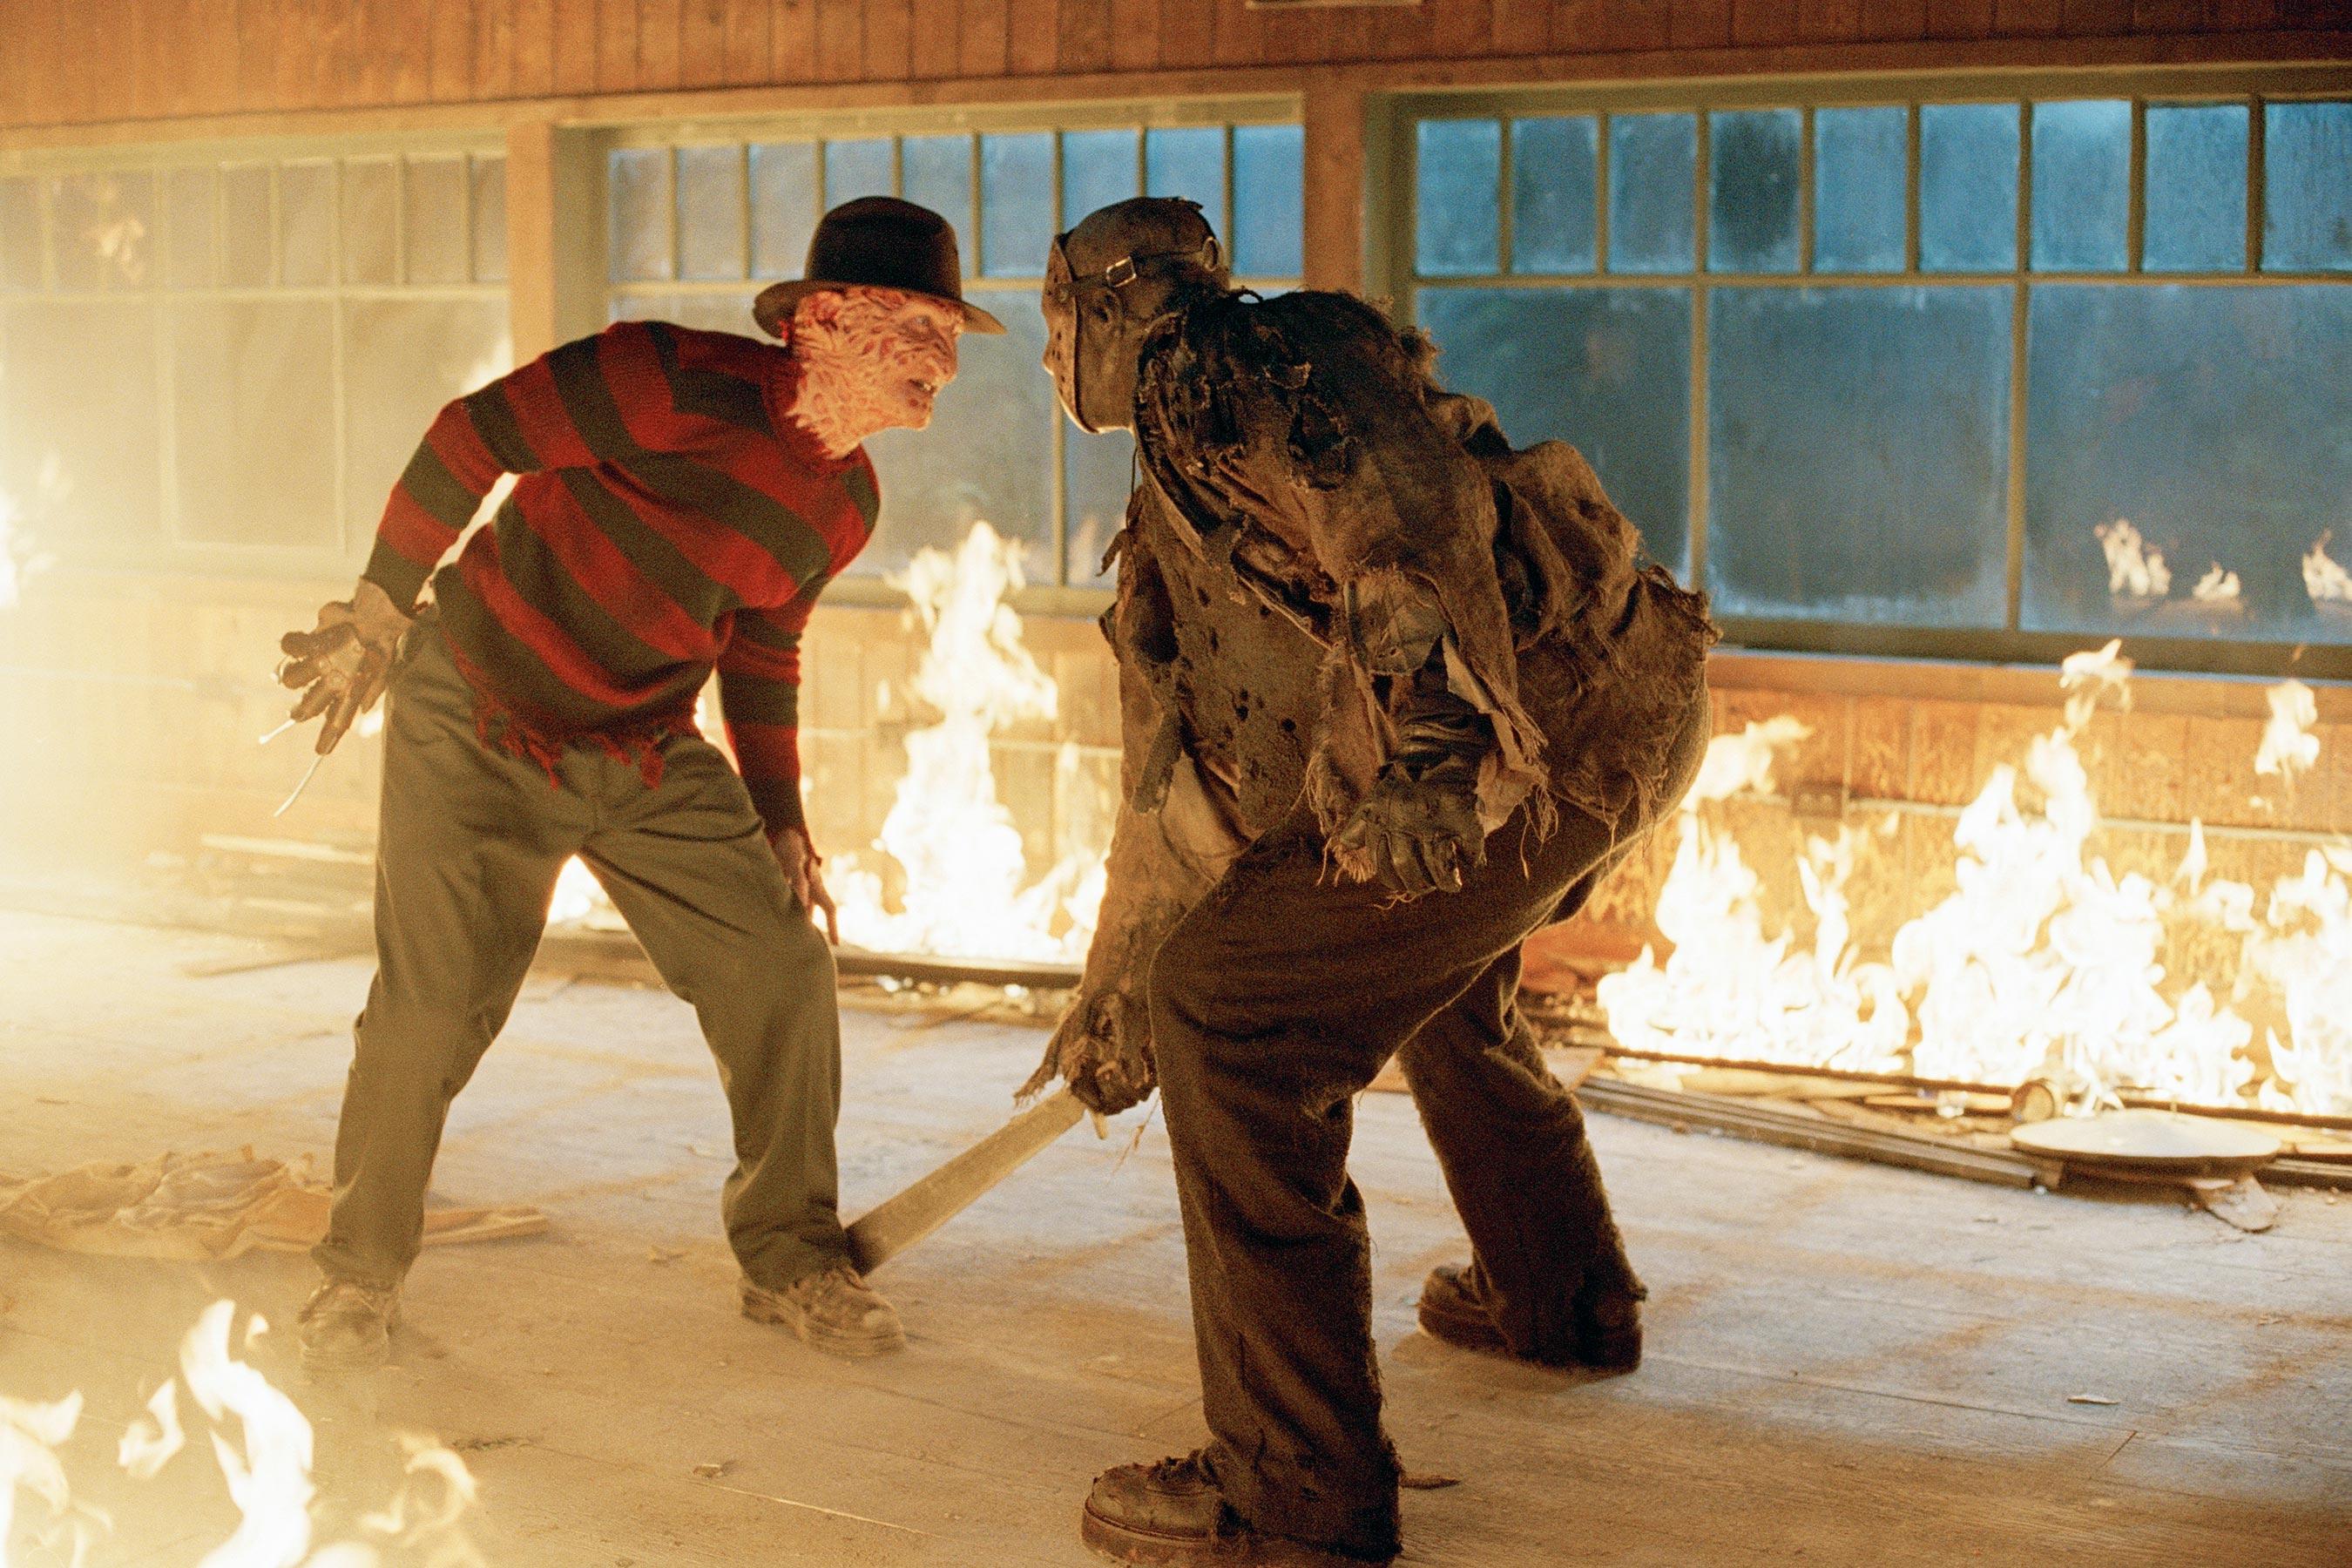 Climactic showdown between (l to r) Freddy (Robert Englund) and Jason (Ken Kirzinger) in Freddy vs. Jason (2003)